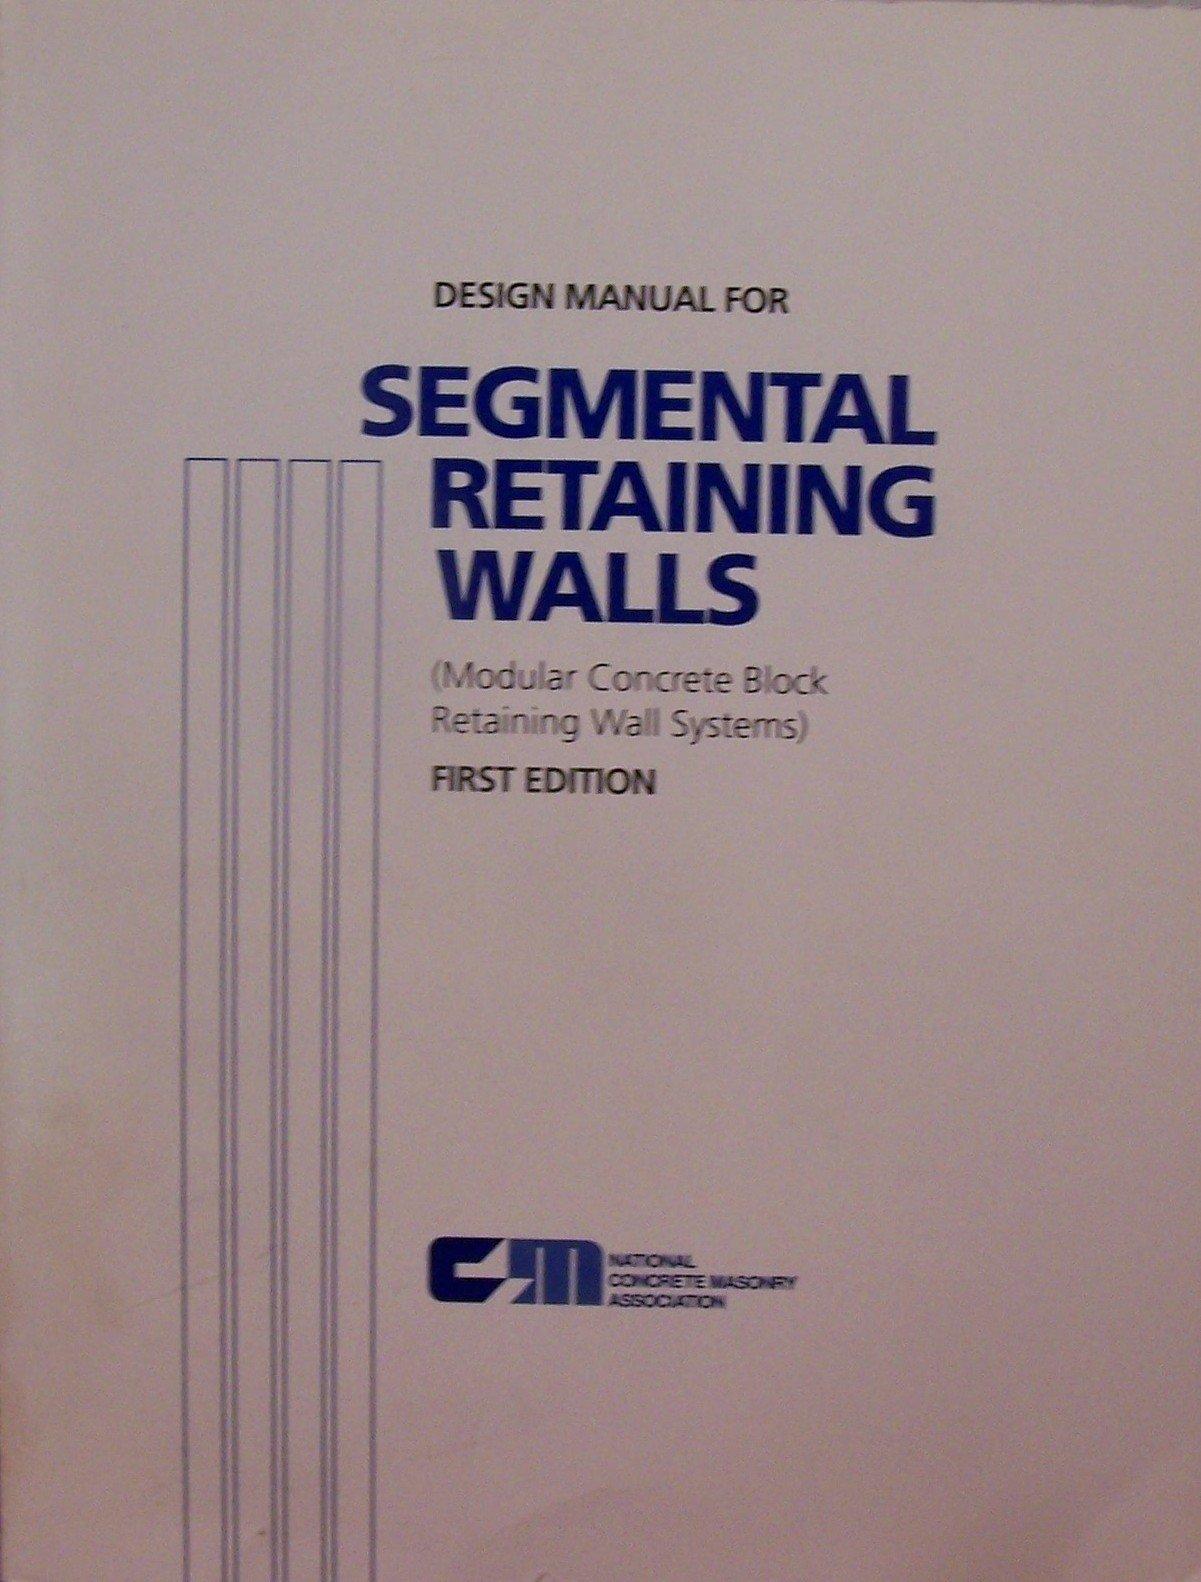 segmental retaining wall design sanuathlon - Segmental Retaining Wall Design